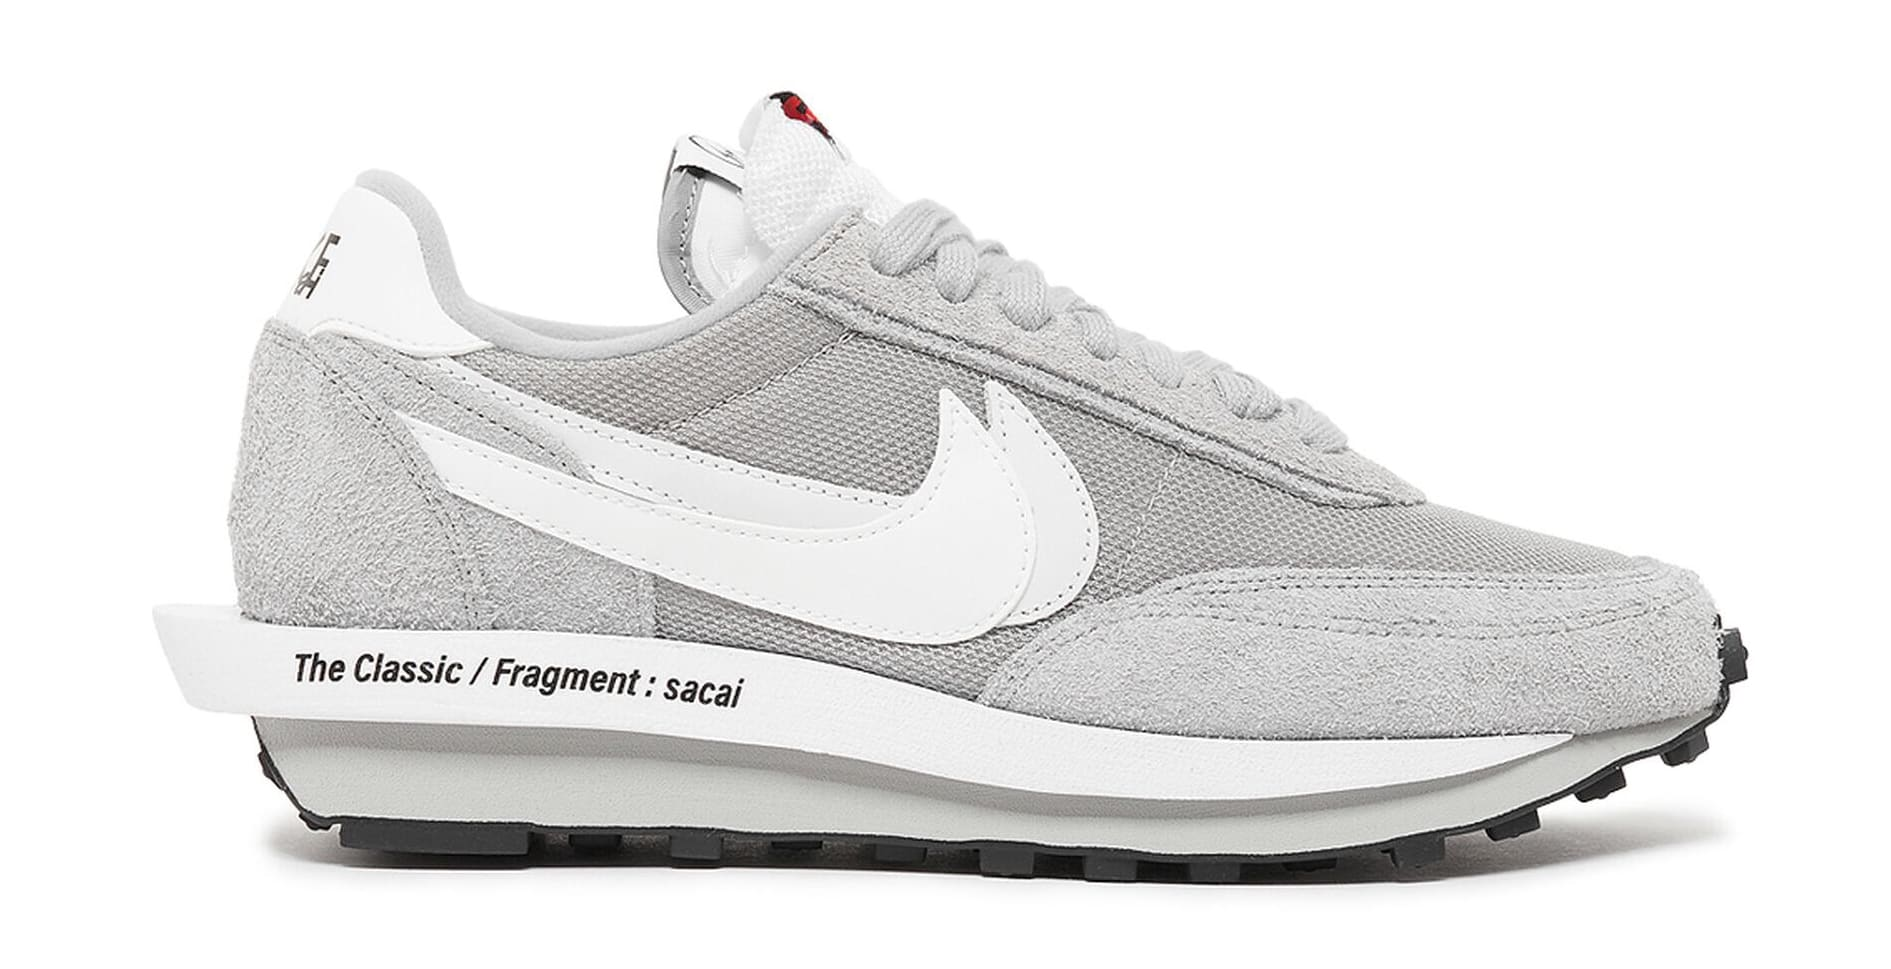 Fragment x Sacai x Nike LDWaffle 'Grey' DH2684-001 Lateral